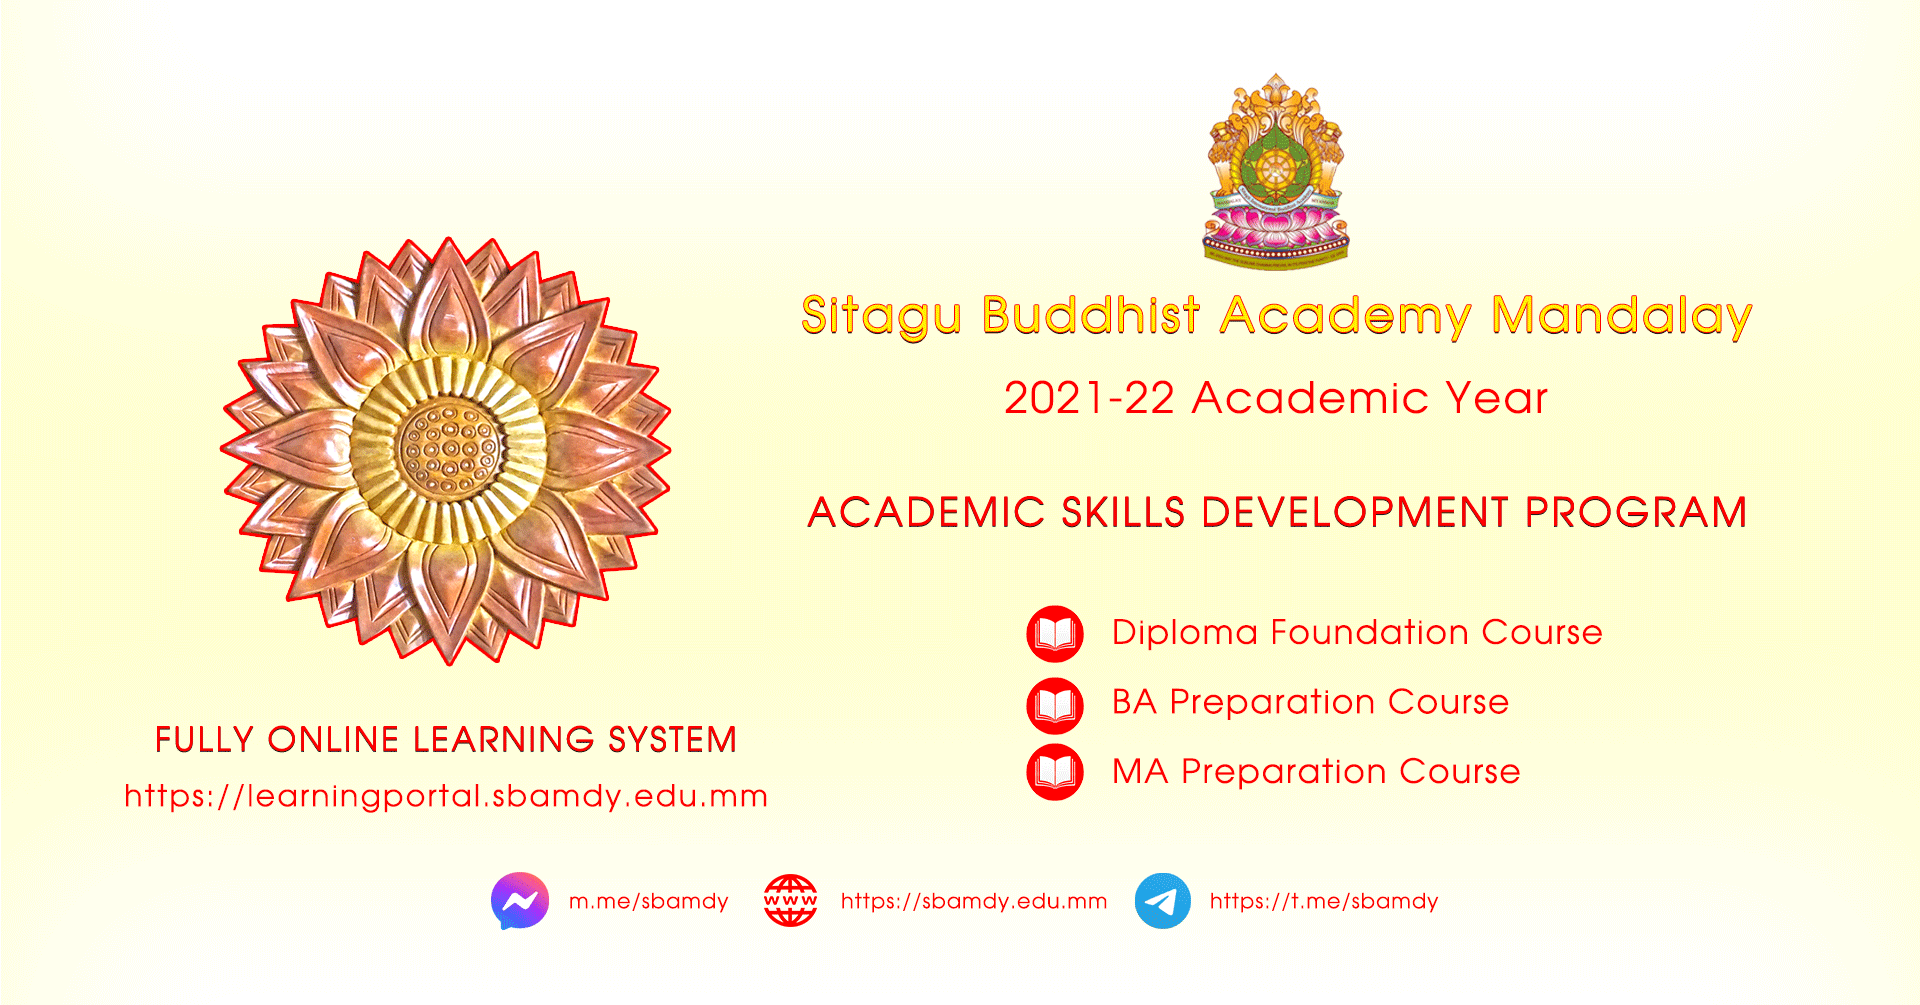 Academic Skills Development